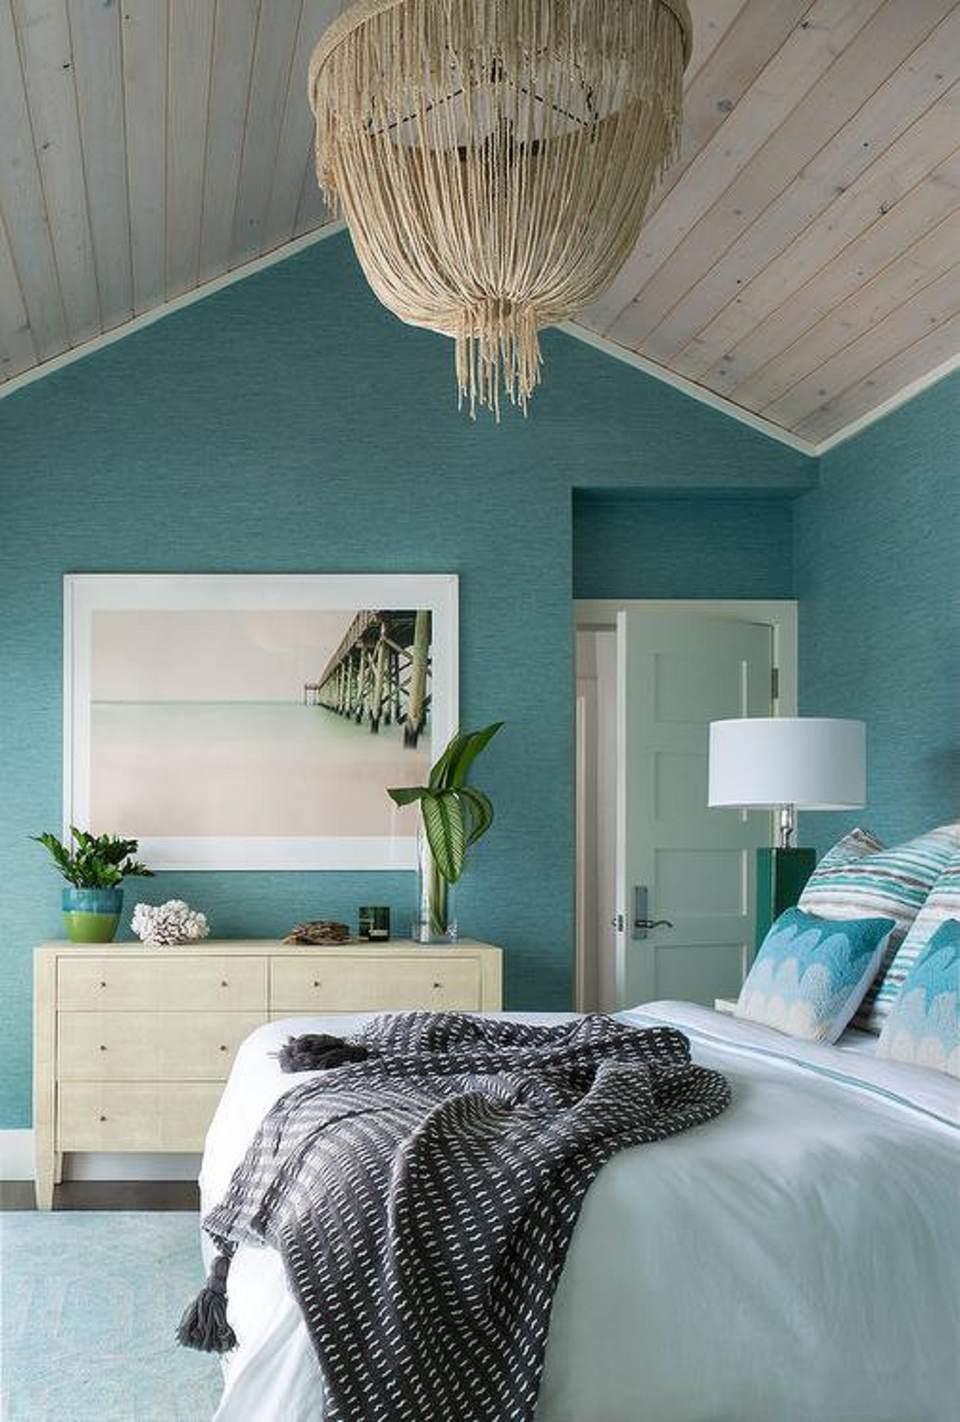 6 Gorgeous Beach Bedroom Decor Ideas in 6  Beach bedroom